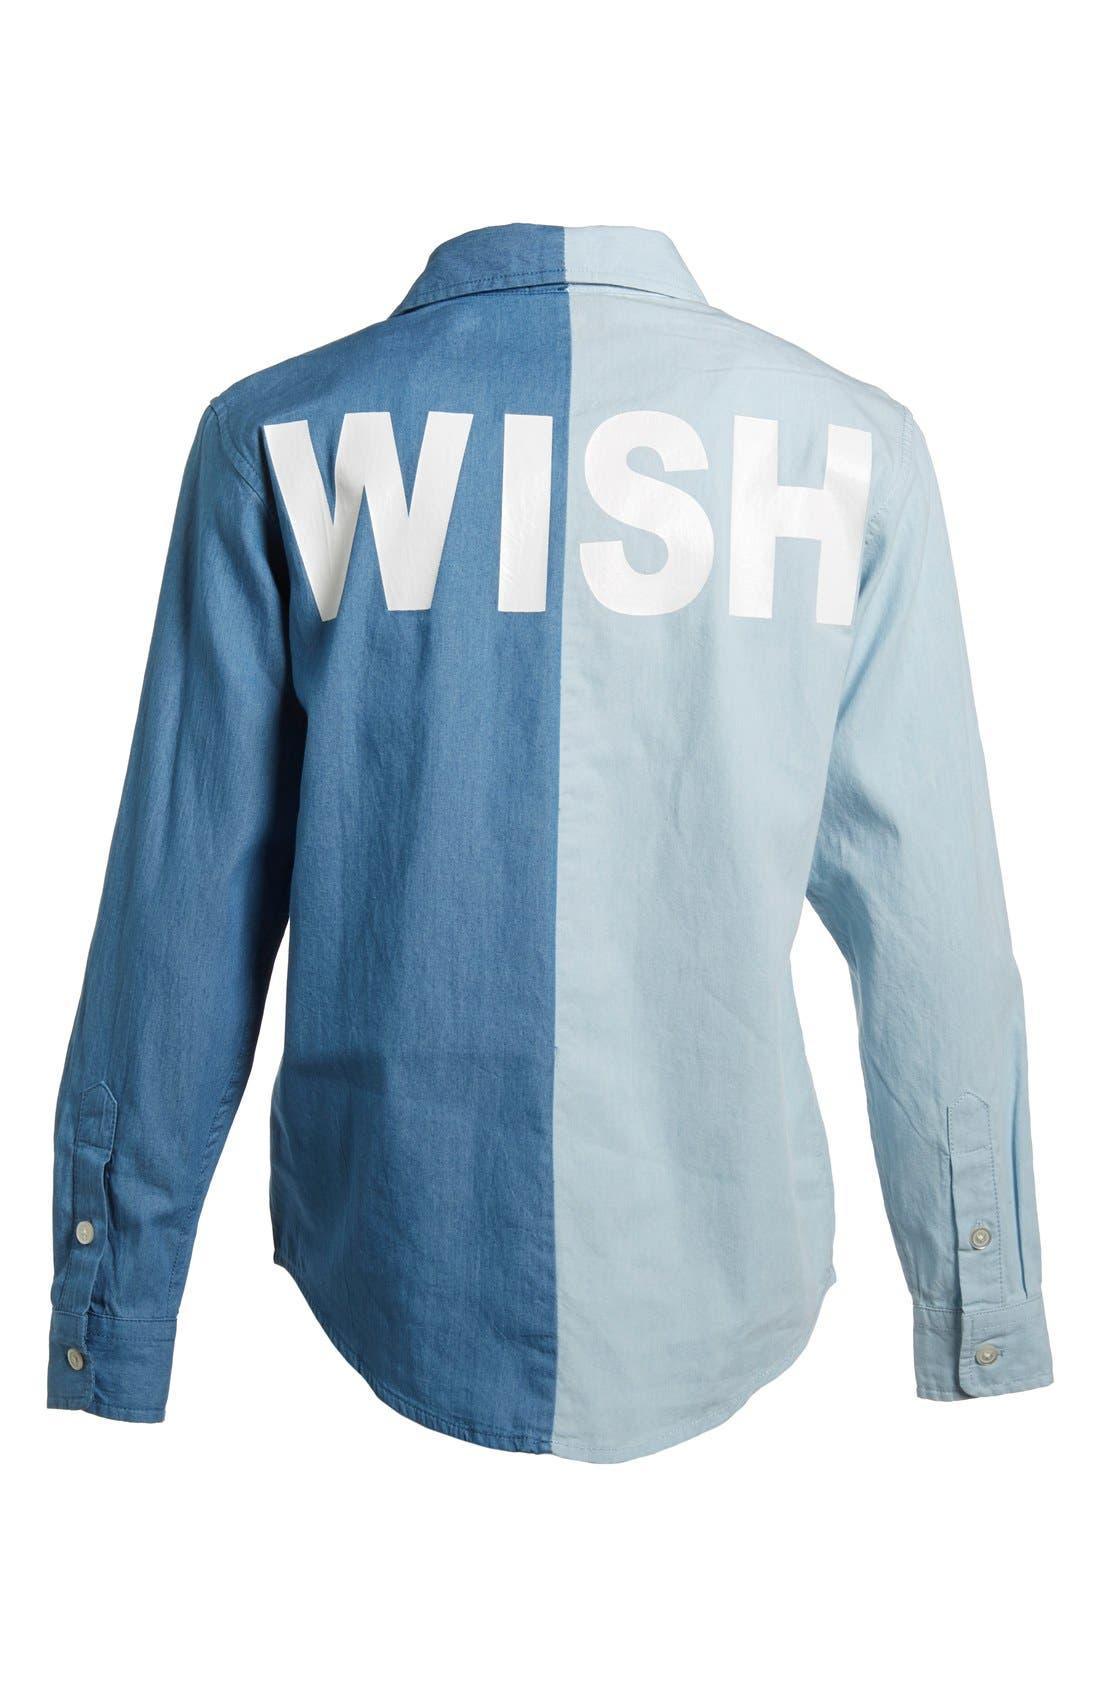 Alternate Image 7  - Mini Cream 'Mini Wish' Two-Tone Chambray Shirt (Women)